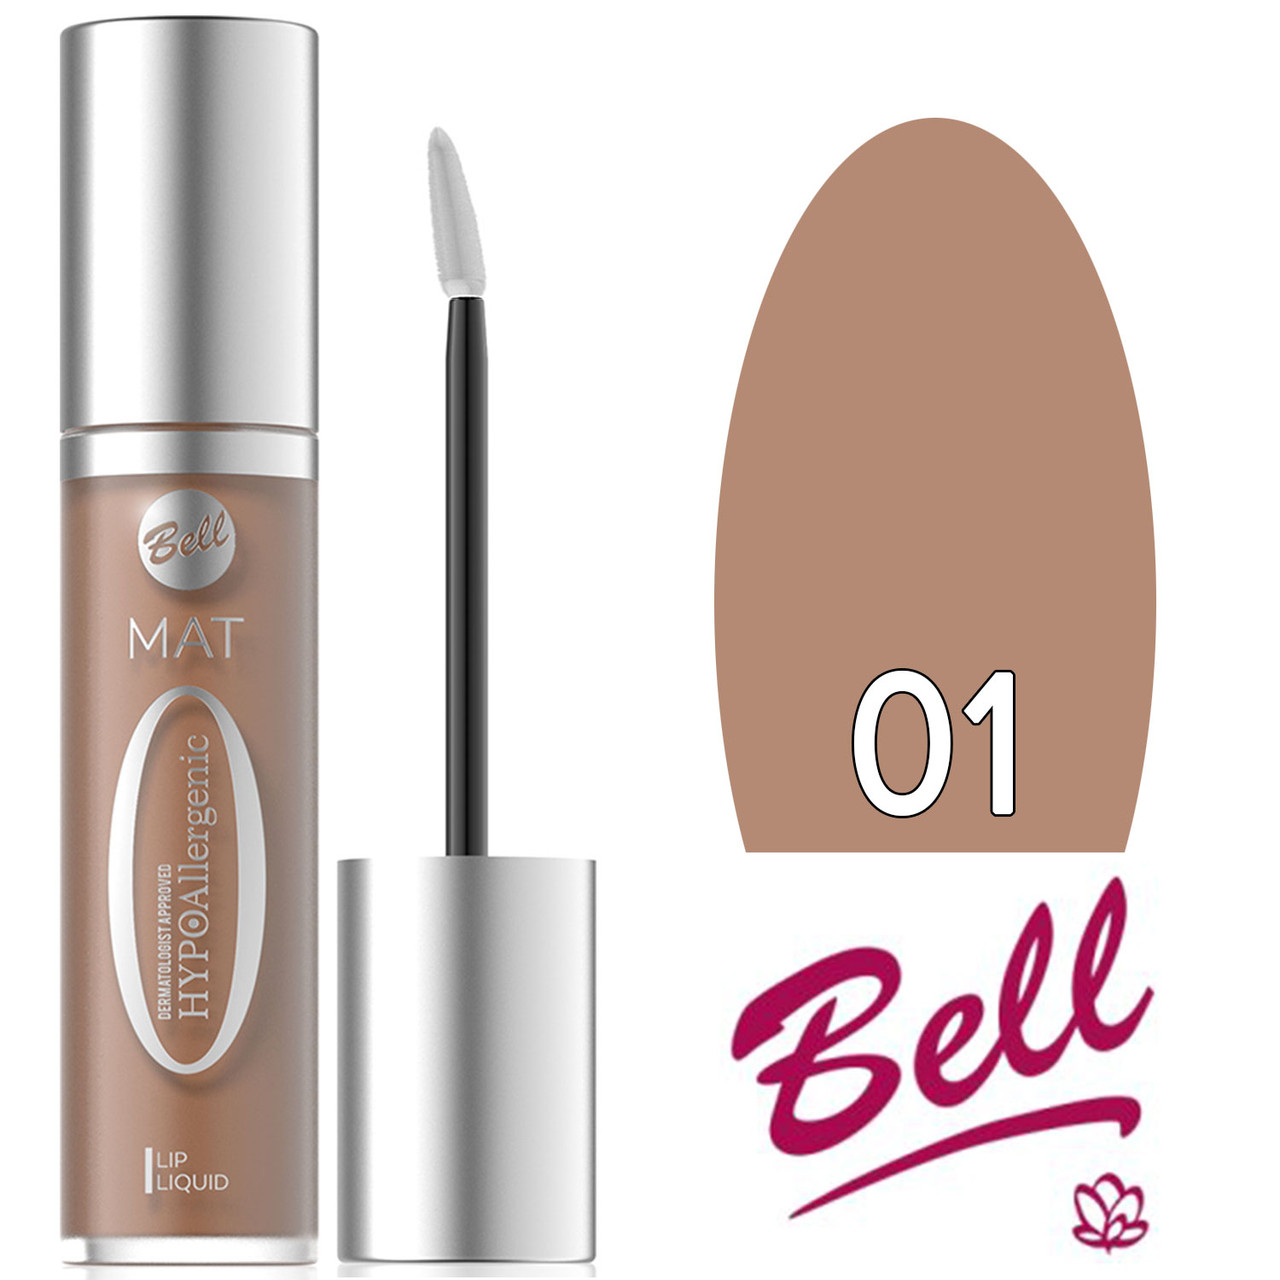 Bell HypoAllergenic - Жидкая губная помада Mat Lip Liquid Тон 01 natural матовая